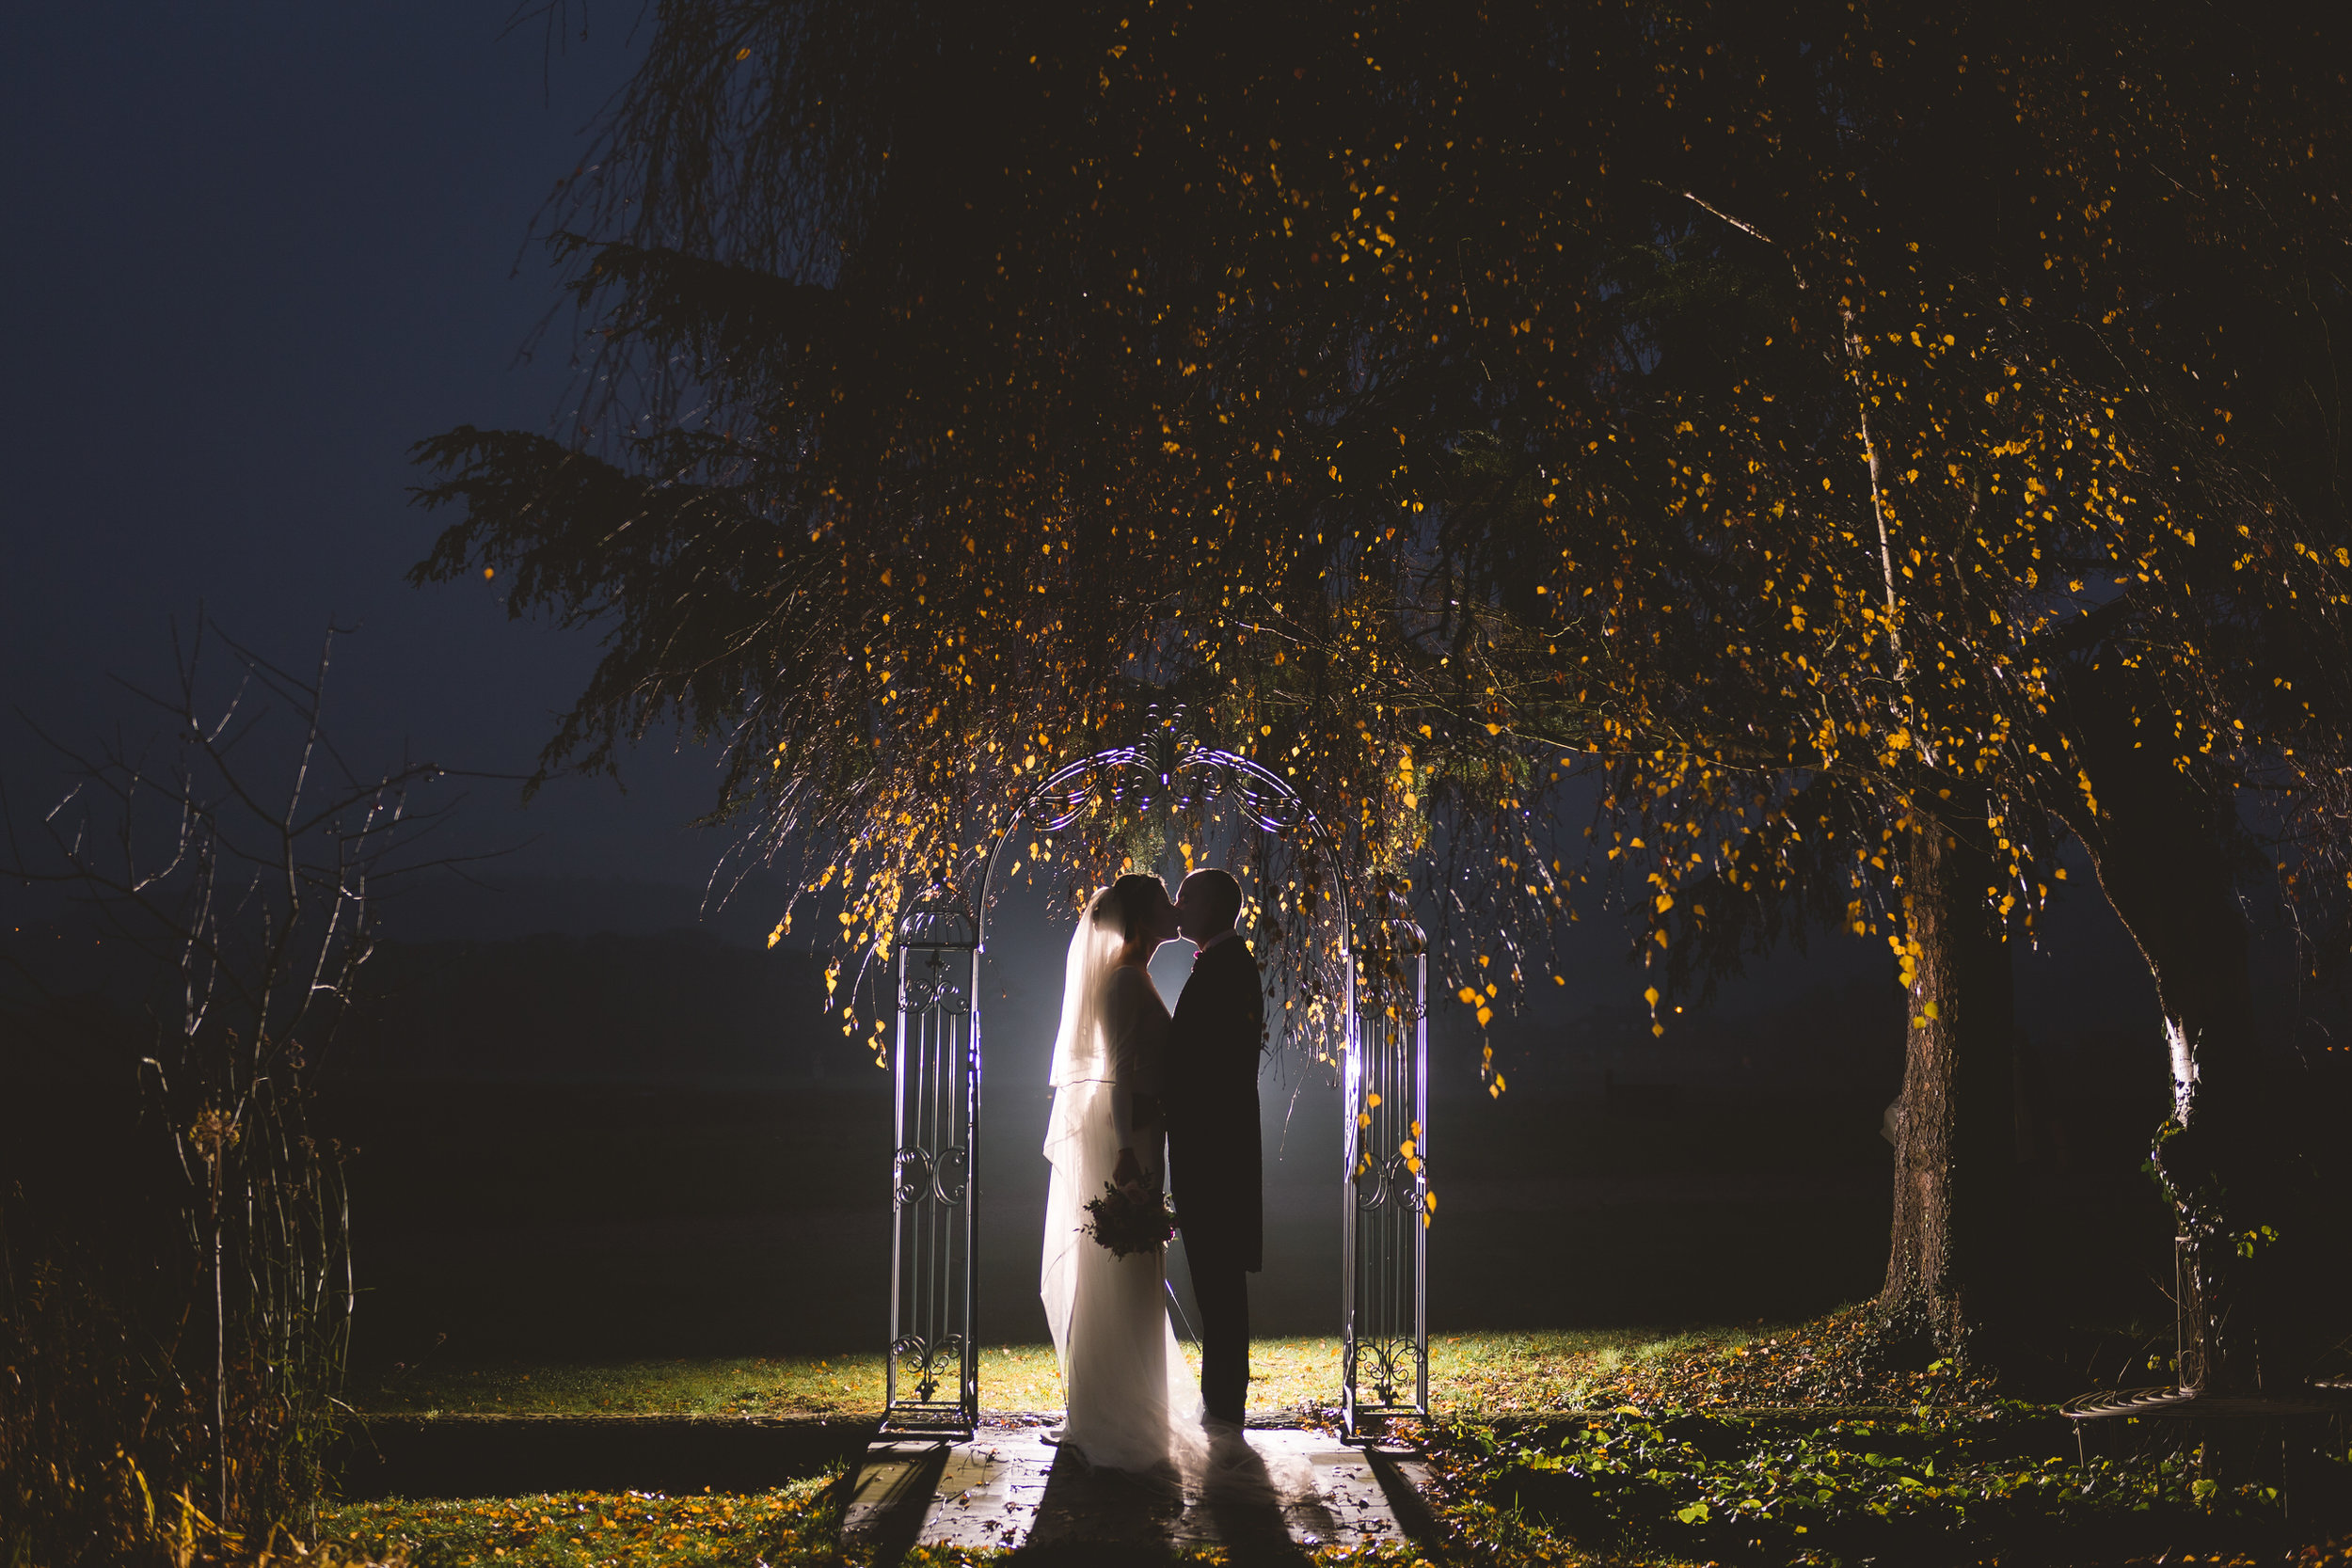 wharfedale-grange-harrogate-wedding-photographer-55.jpg